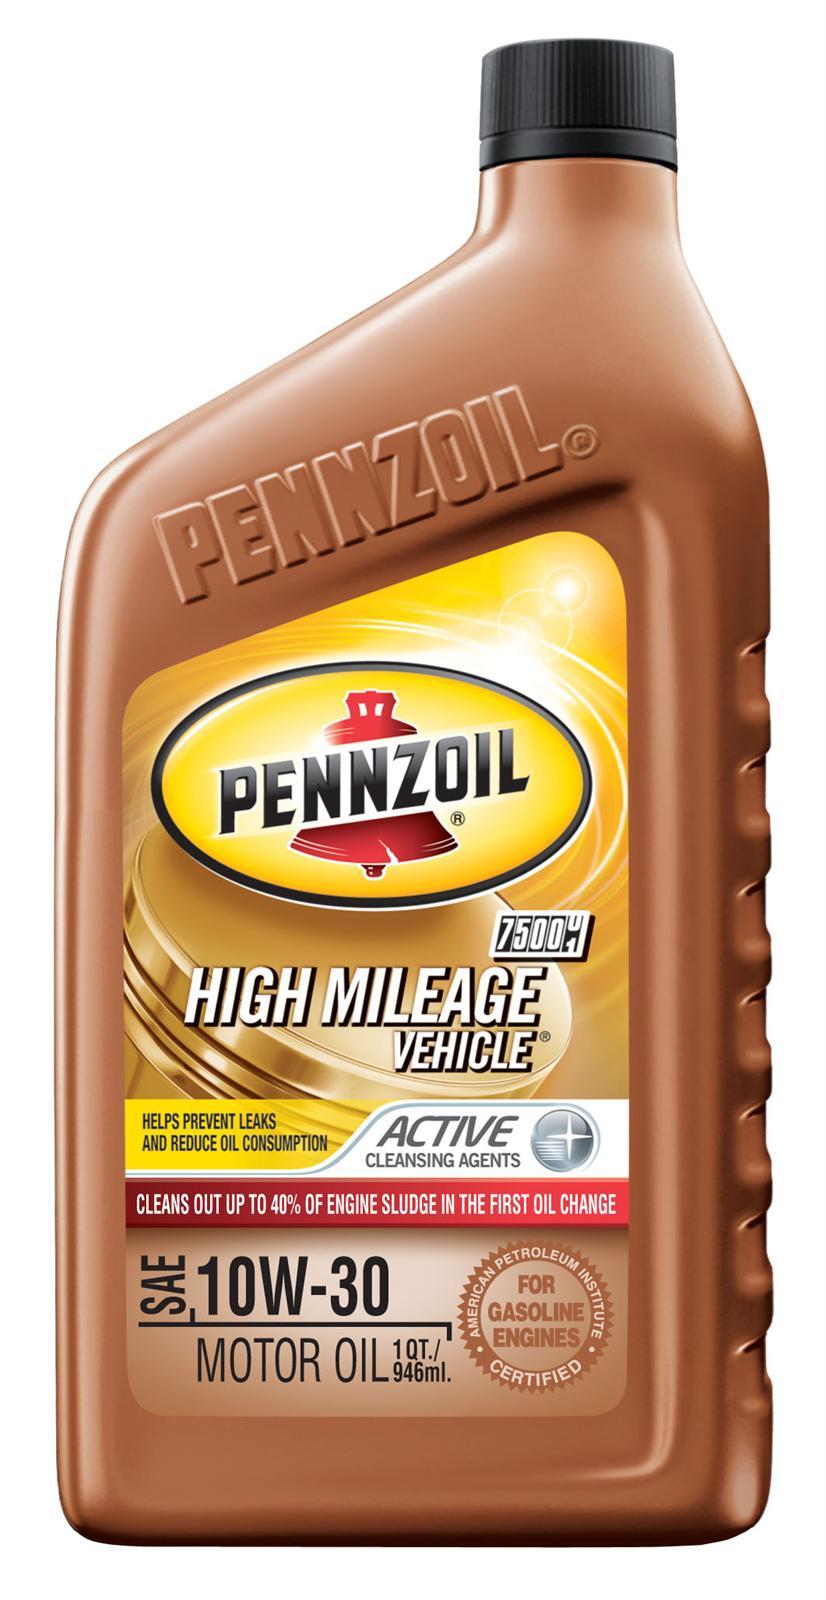 Pennzoil Motor Oil Pennzoil High Mileage 10w30 1 Quart